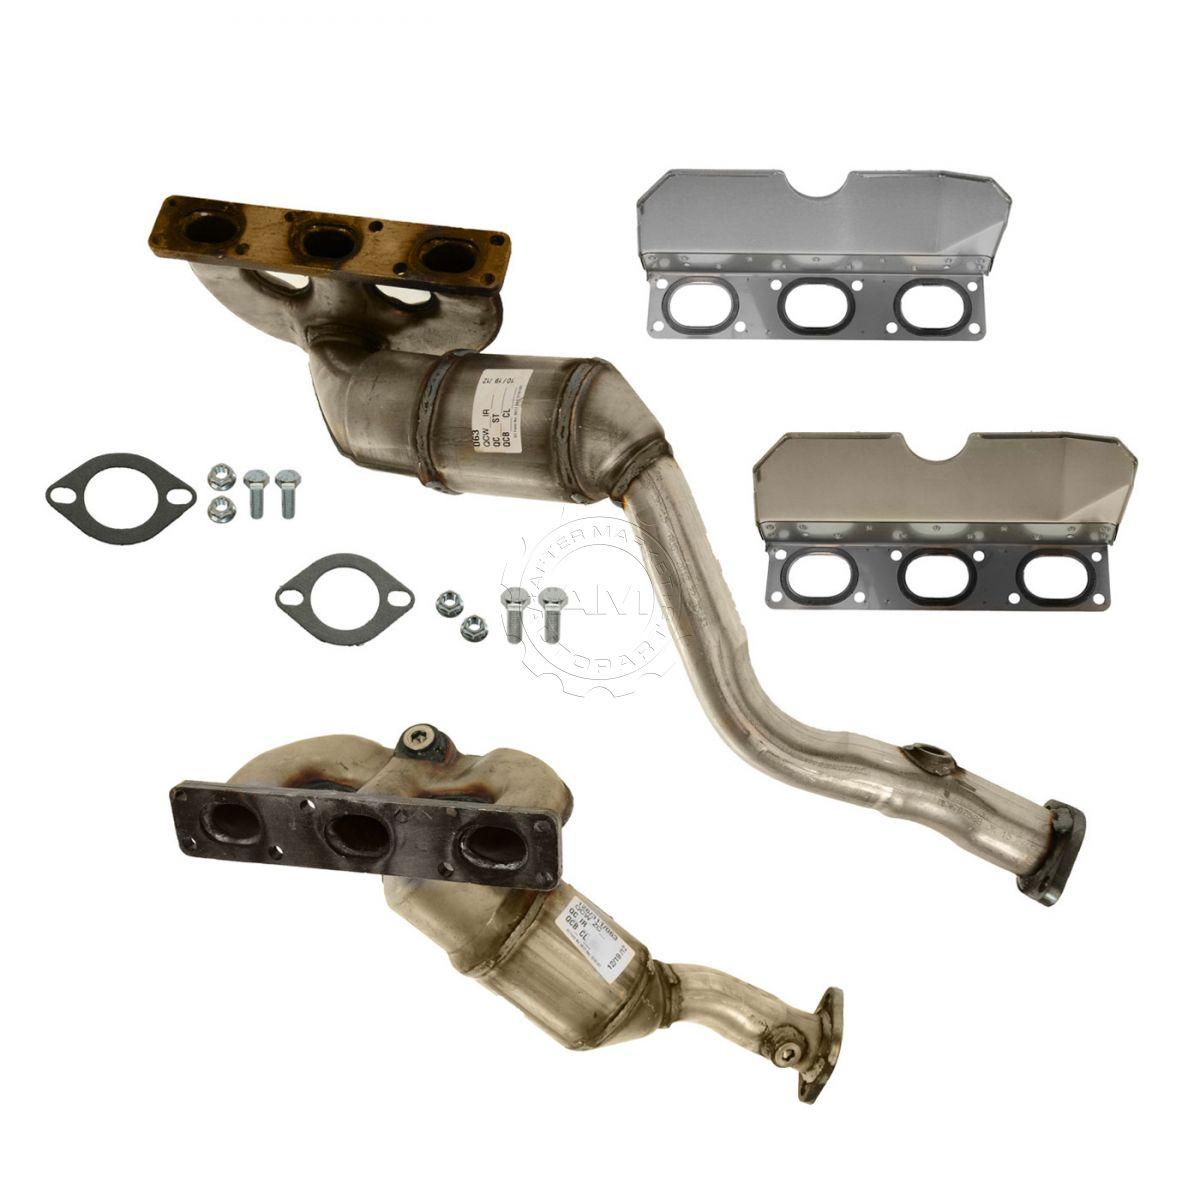 Bmw Z3 Exhaust: Dorman Exhaust Manifold Catalytic Converter Pair For BMW